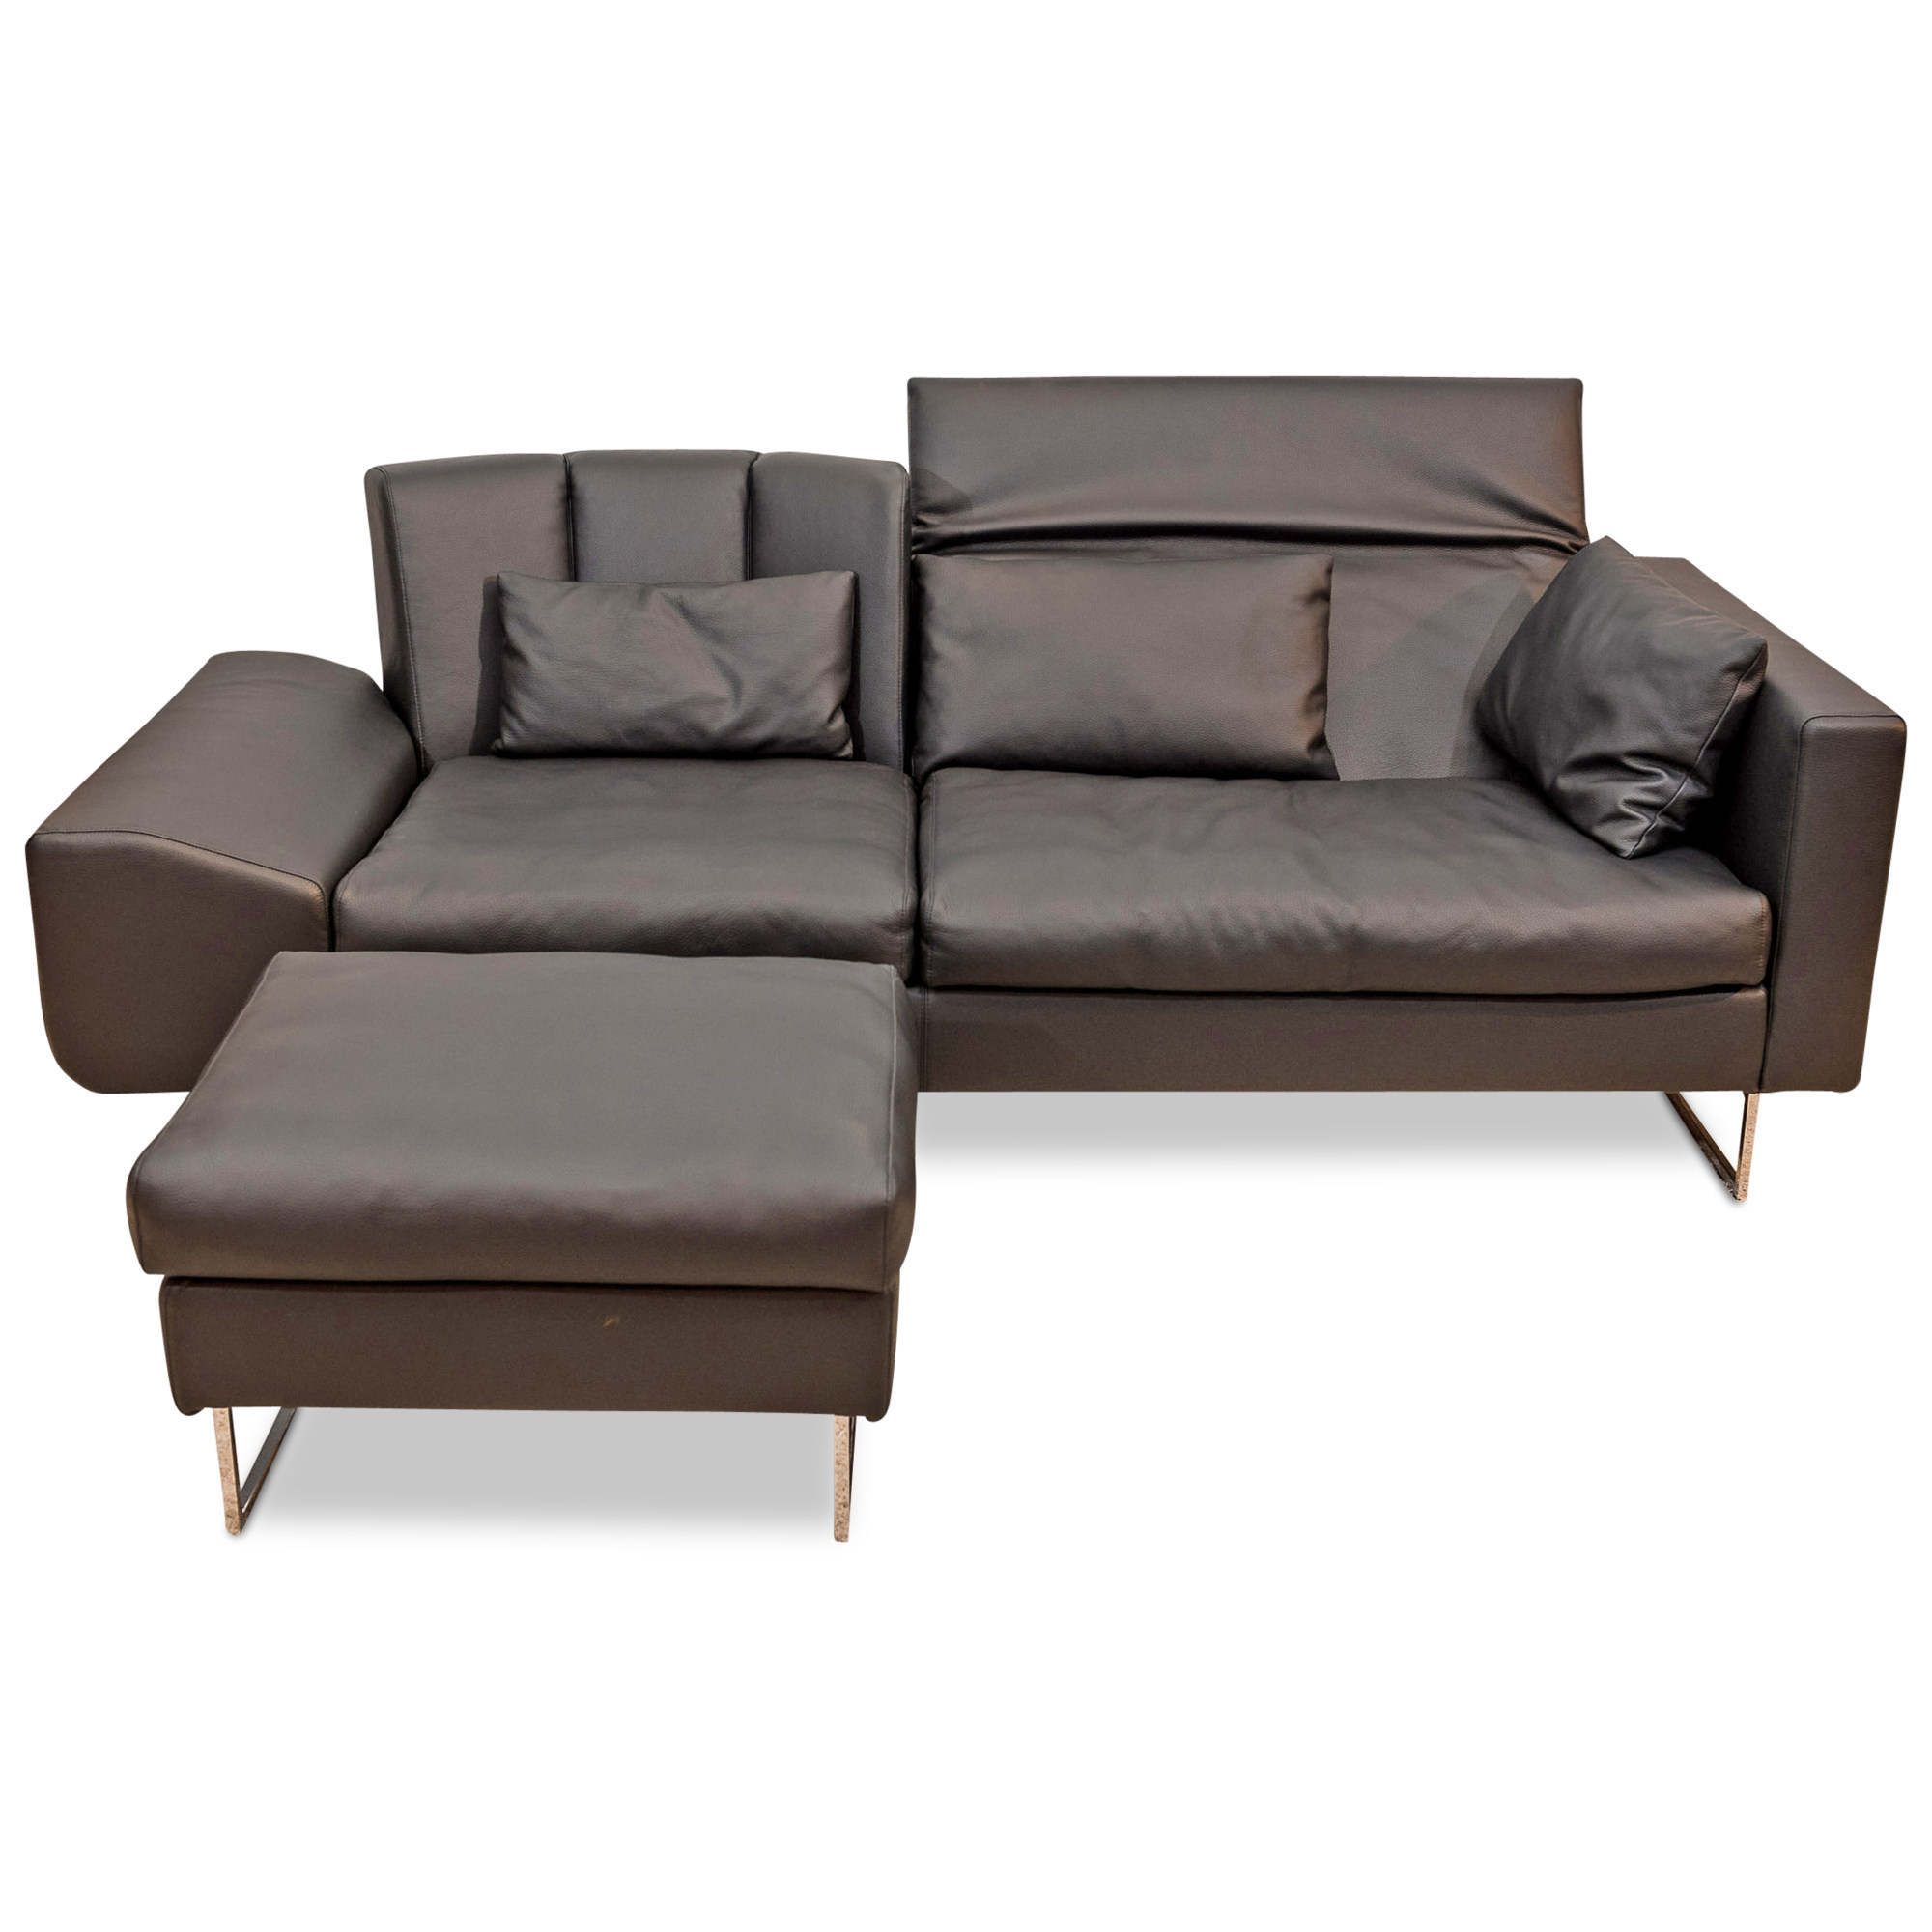 Bruhl Designer Sofa Embrace Mit Hocker Leder Metall Schwarz Chrom